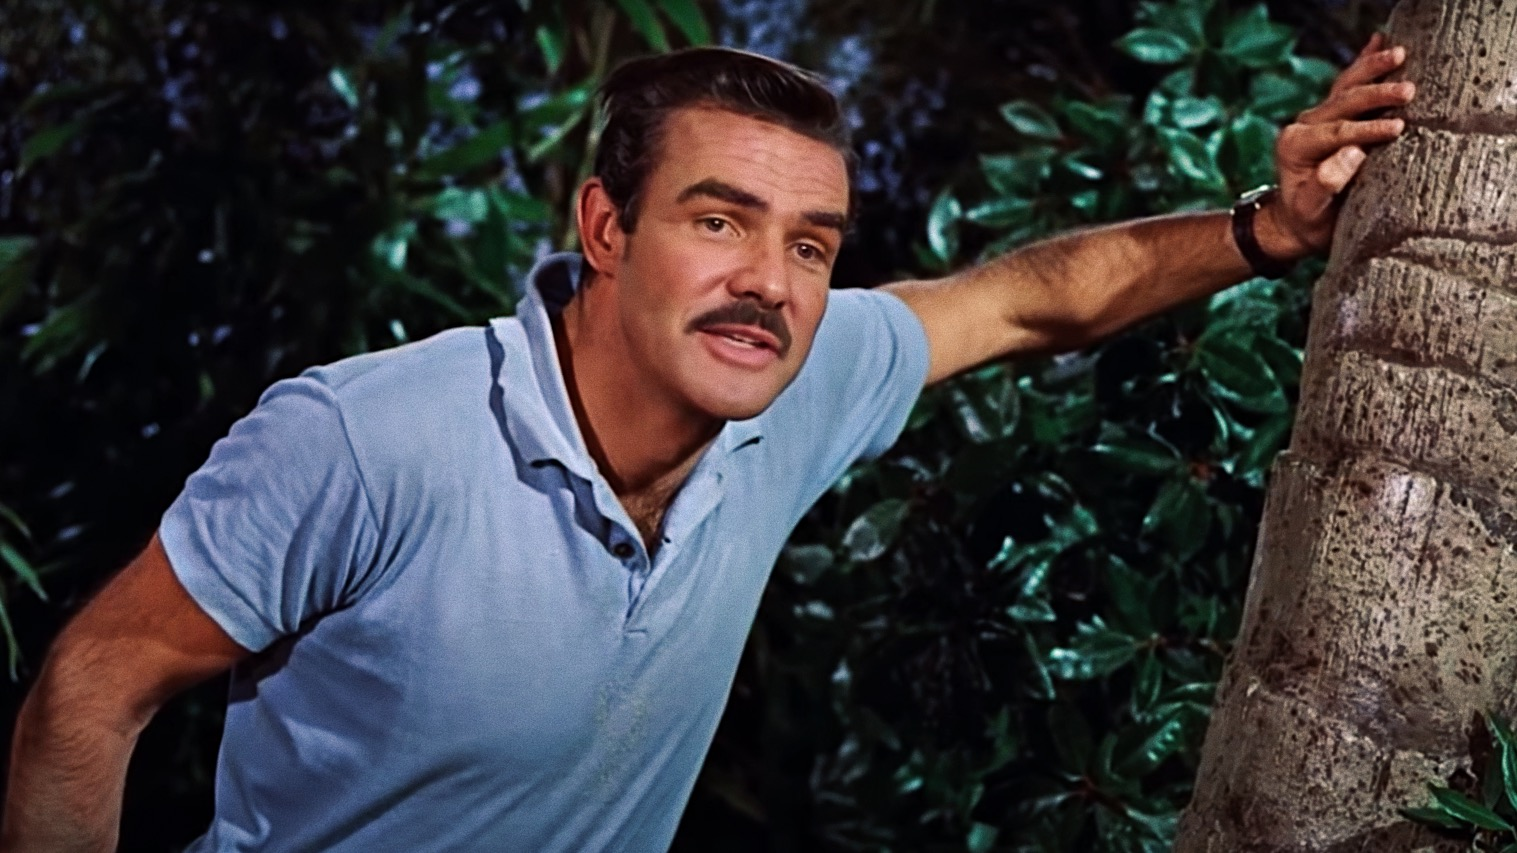 Burt Reynolds is James Bond in Dr. No | Burt Reynolds Deep Fake